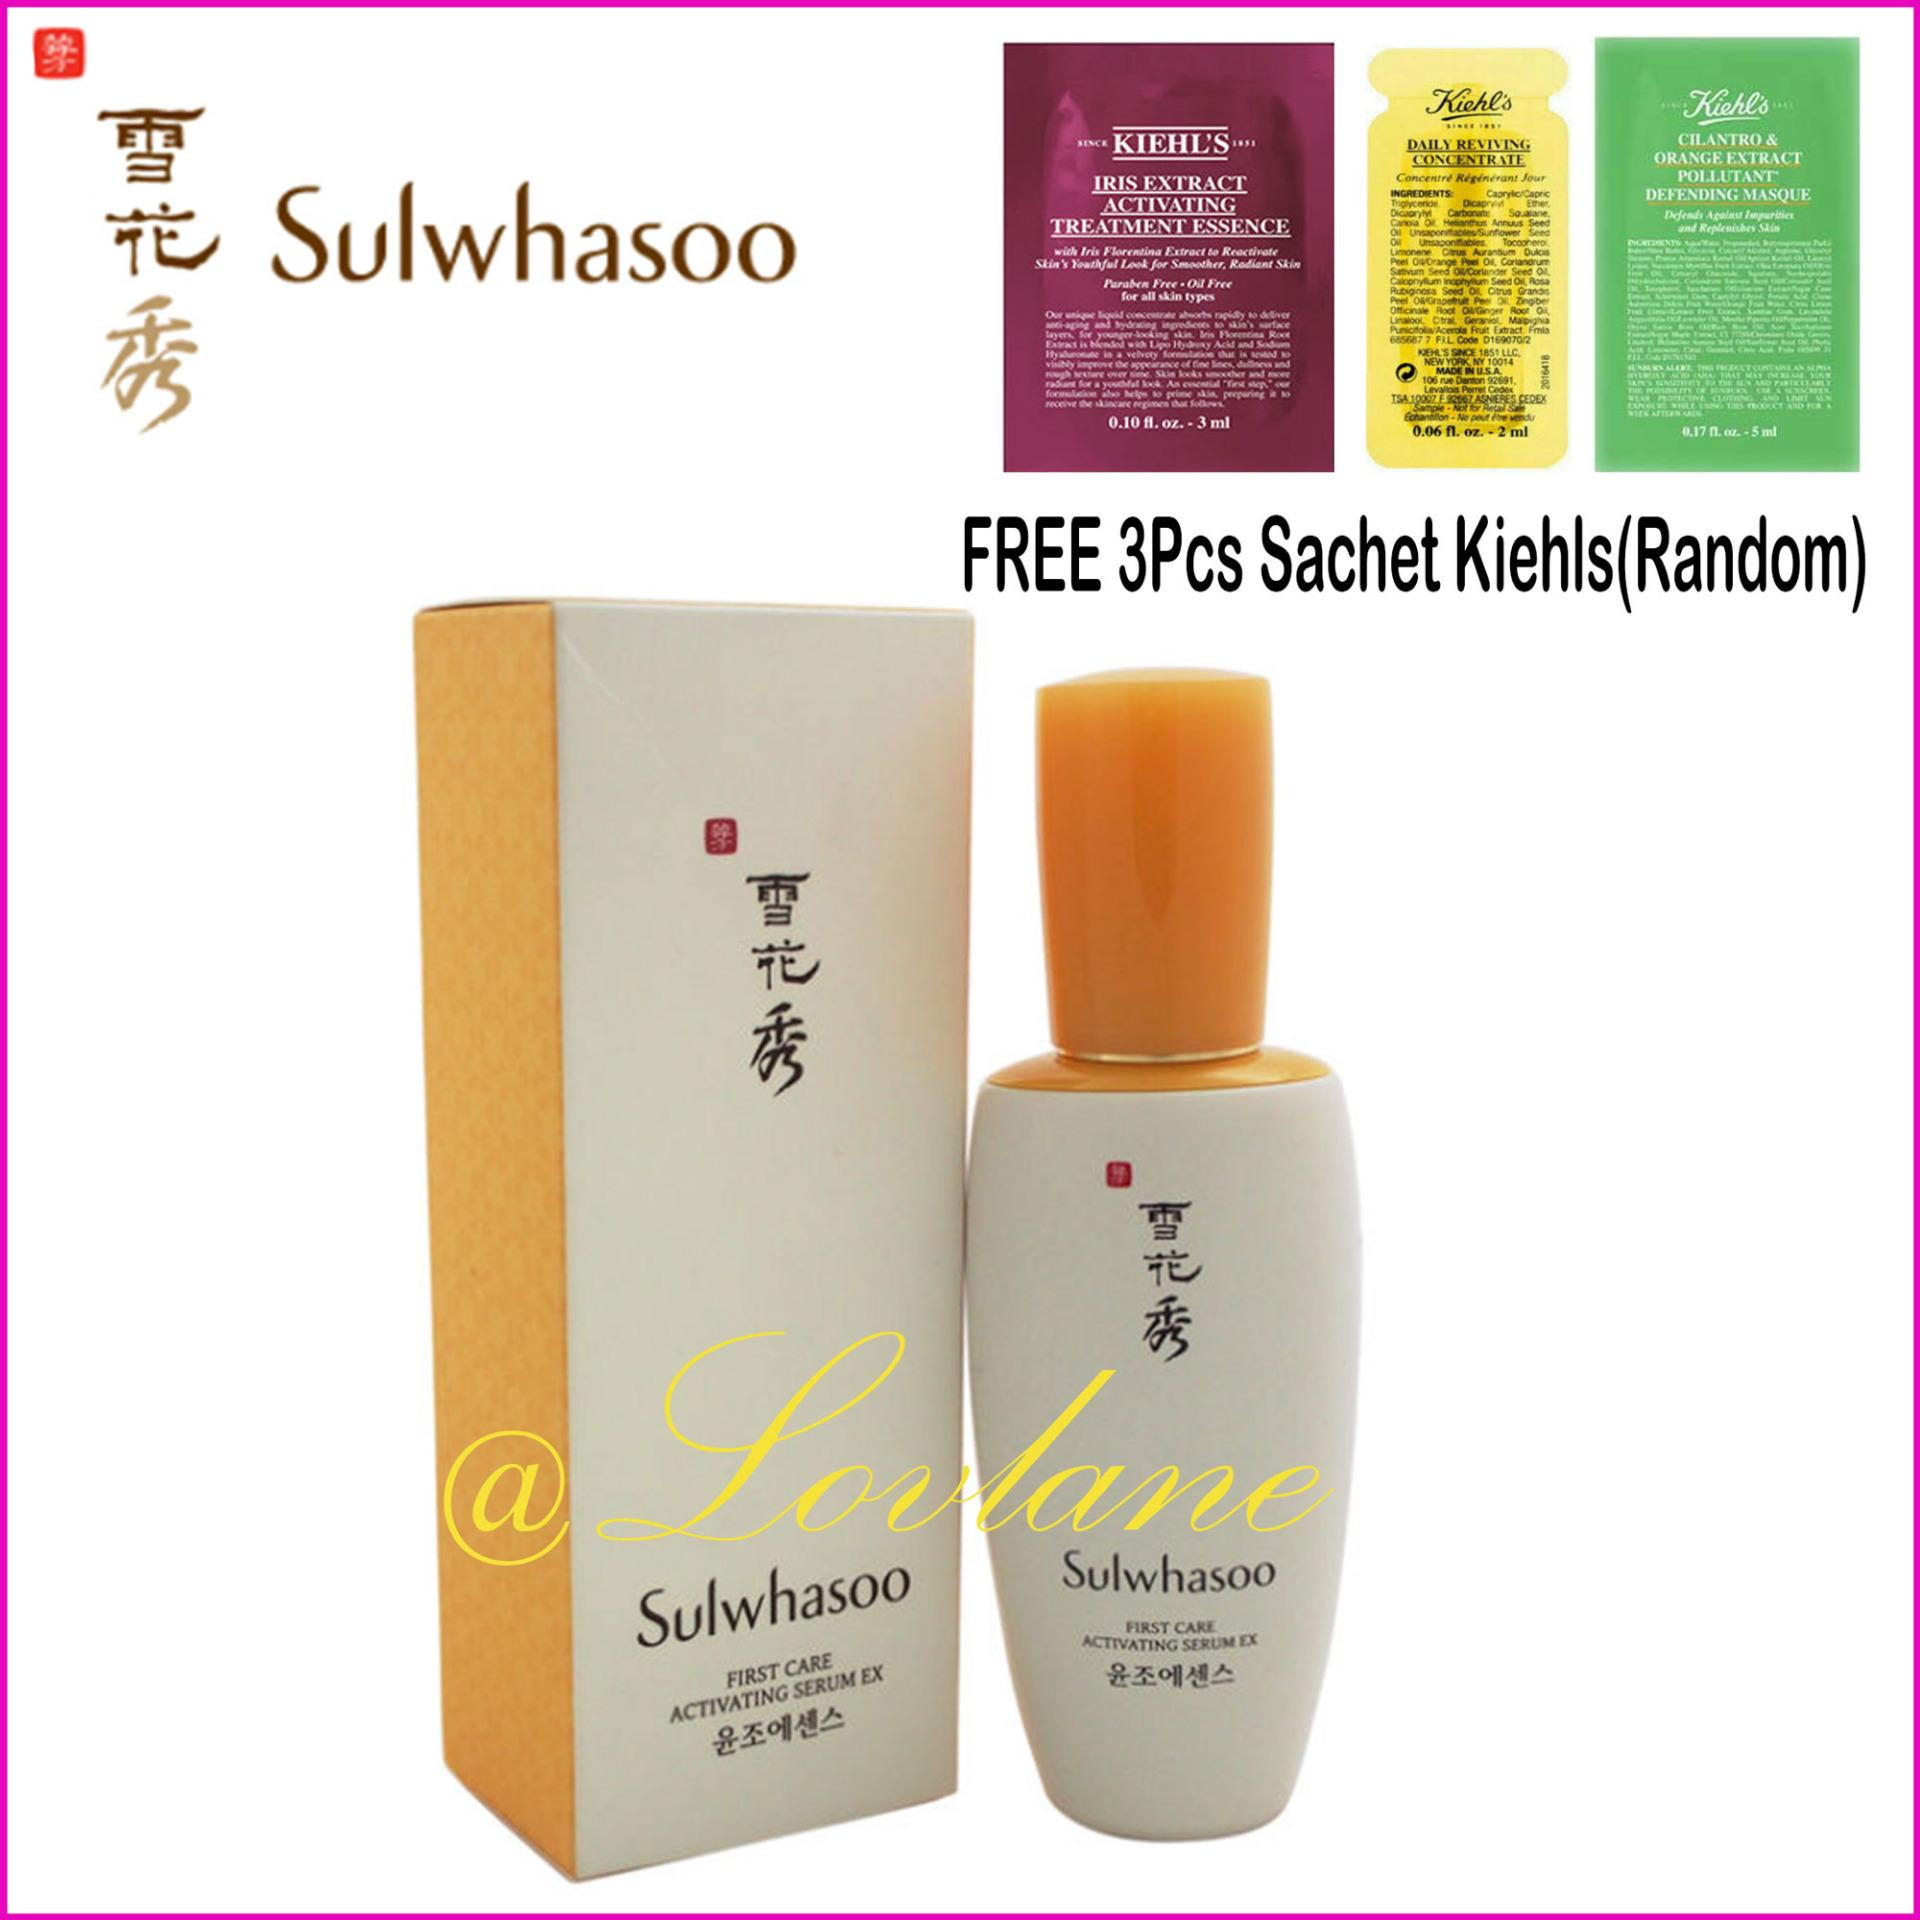 Daftar Harga Sulwashoo Timetresure Renovating Serum Ex 4ml Update Makarizo Honey Dew Pencari Sulwhasoo First Care Activating 60ml Original Flash Sale